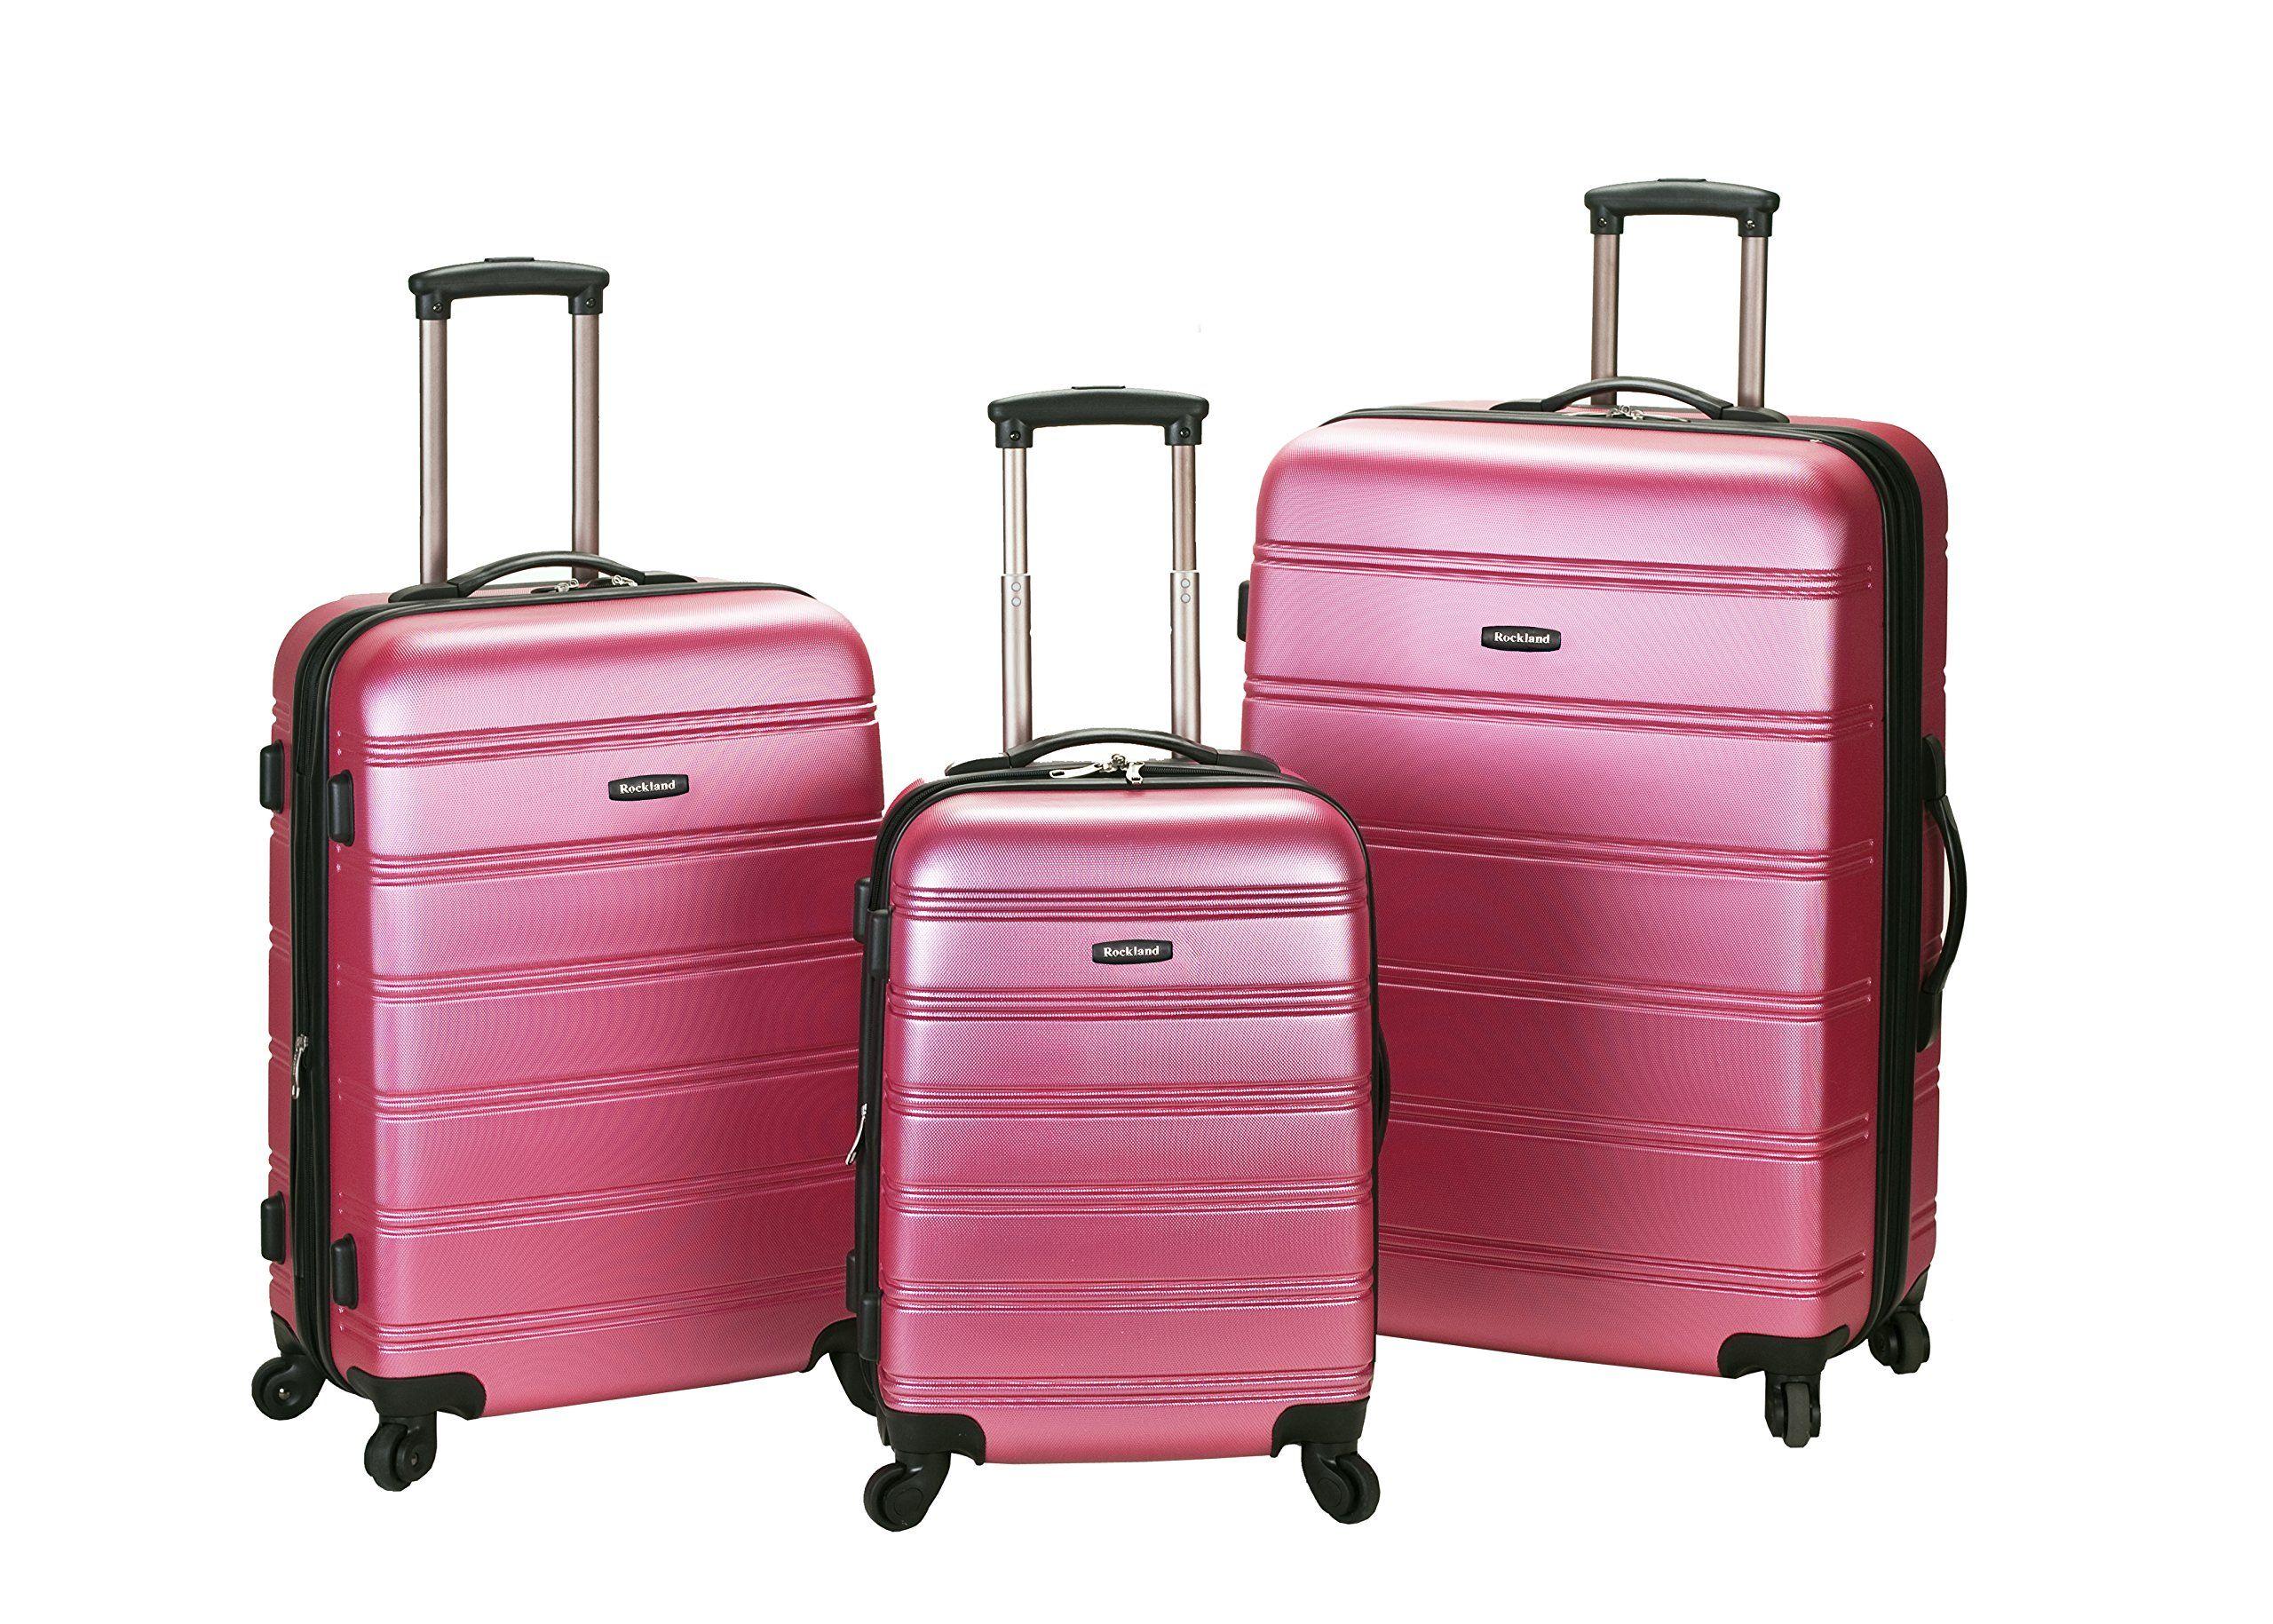 Rockland Luggage Melbourne 3 Piece Abs Luggage Set, Pink, Medium ...